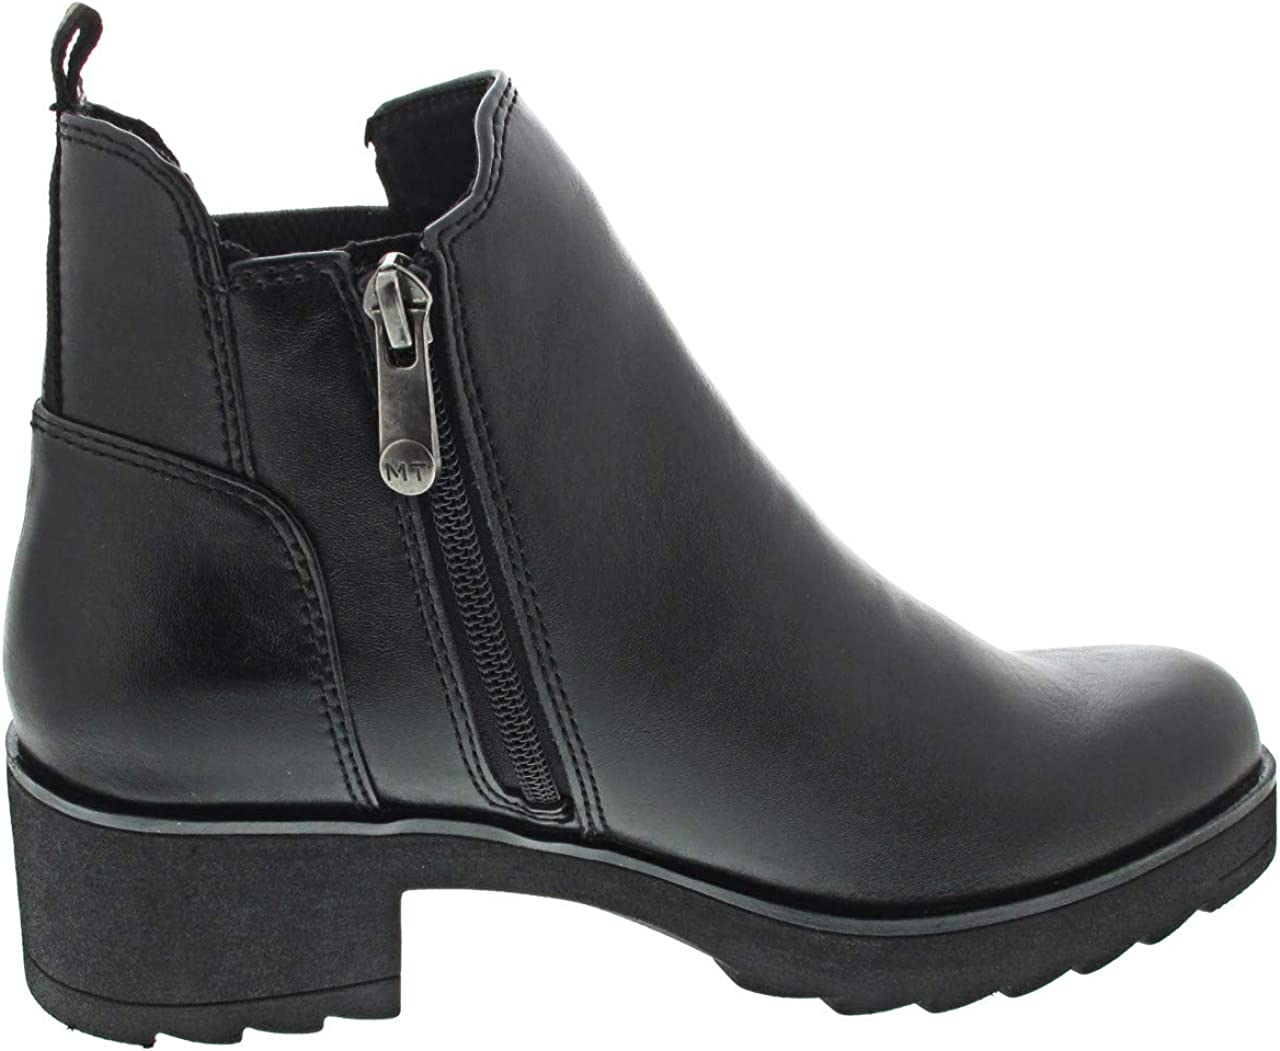 Fabrikpreis Rabatt begrenzen Besonders MARCO TOZZI Damen 2-2-25806-35 Chelsea-Stiefel Black Antic HgoHo UI4RW mPNPY